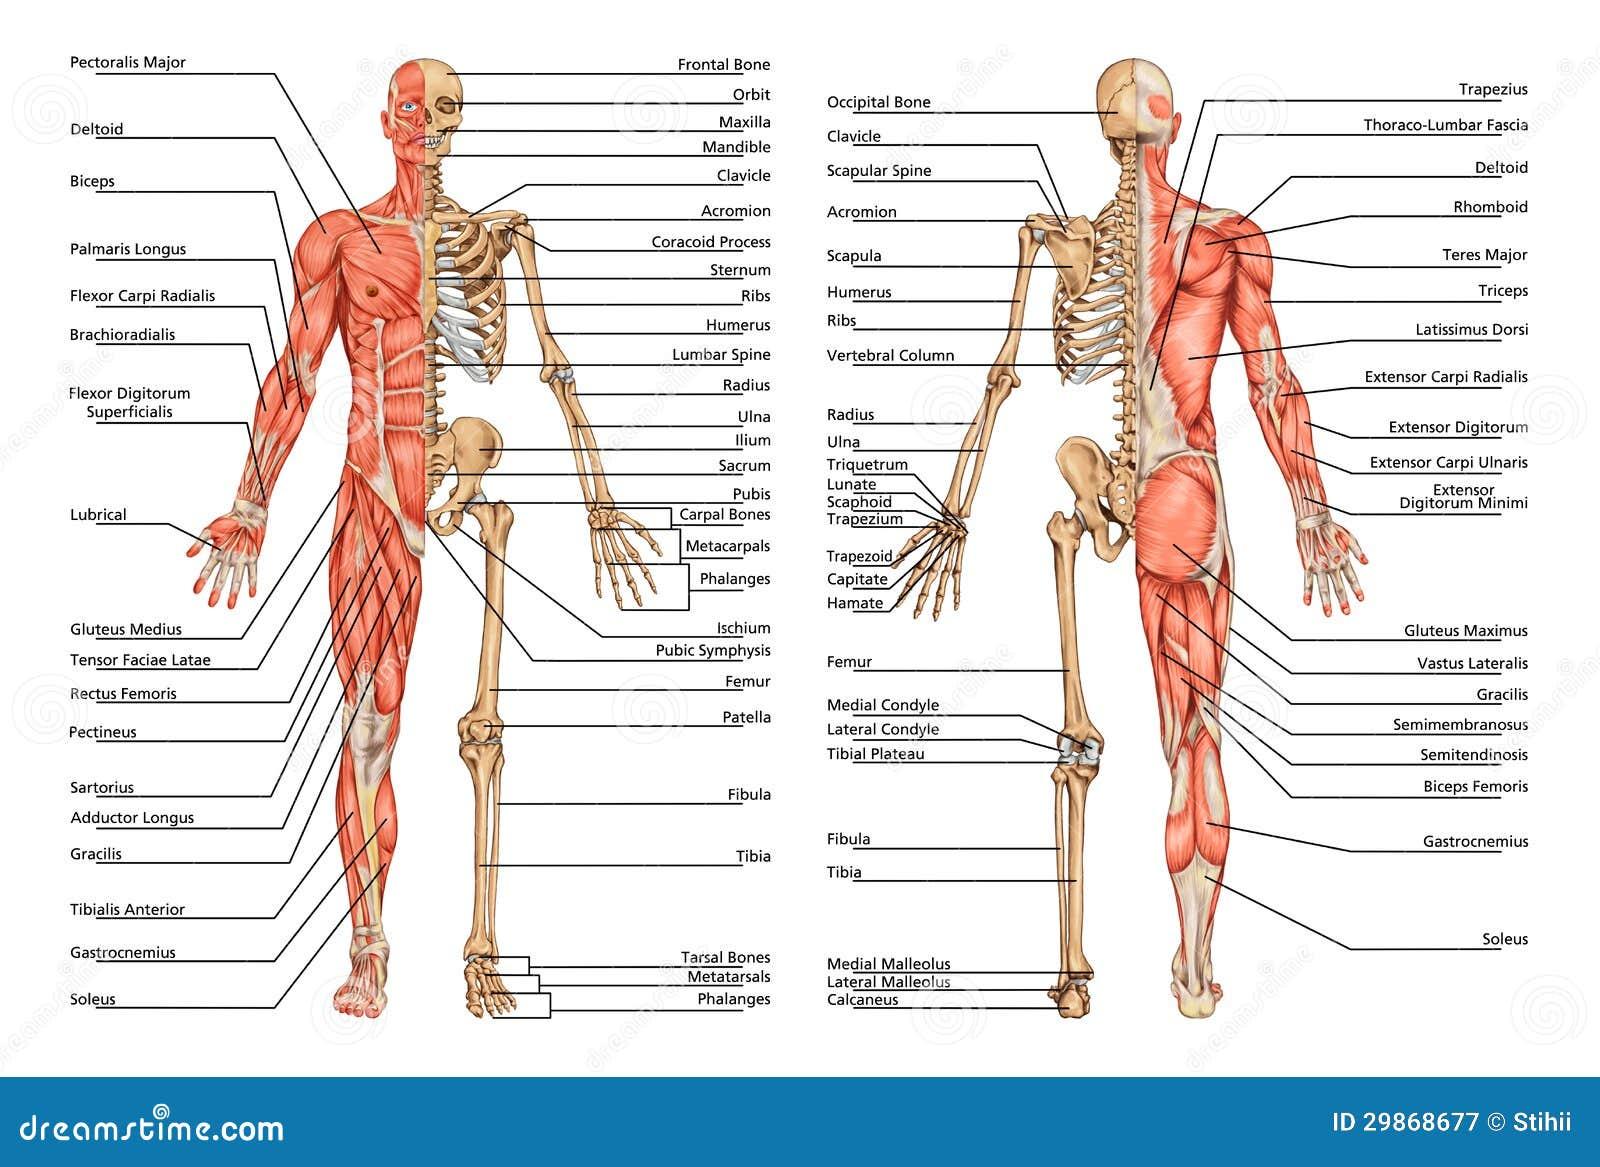 crecida 4 dr plansha schelet fatza fotograf 237 a de archivo libre de regal 237 as imagen 29868677